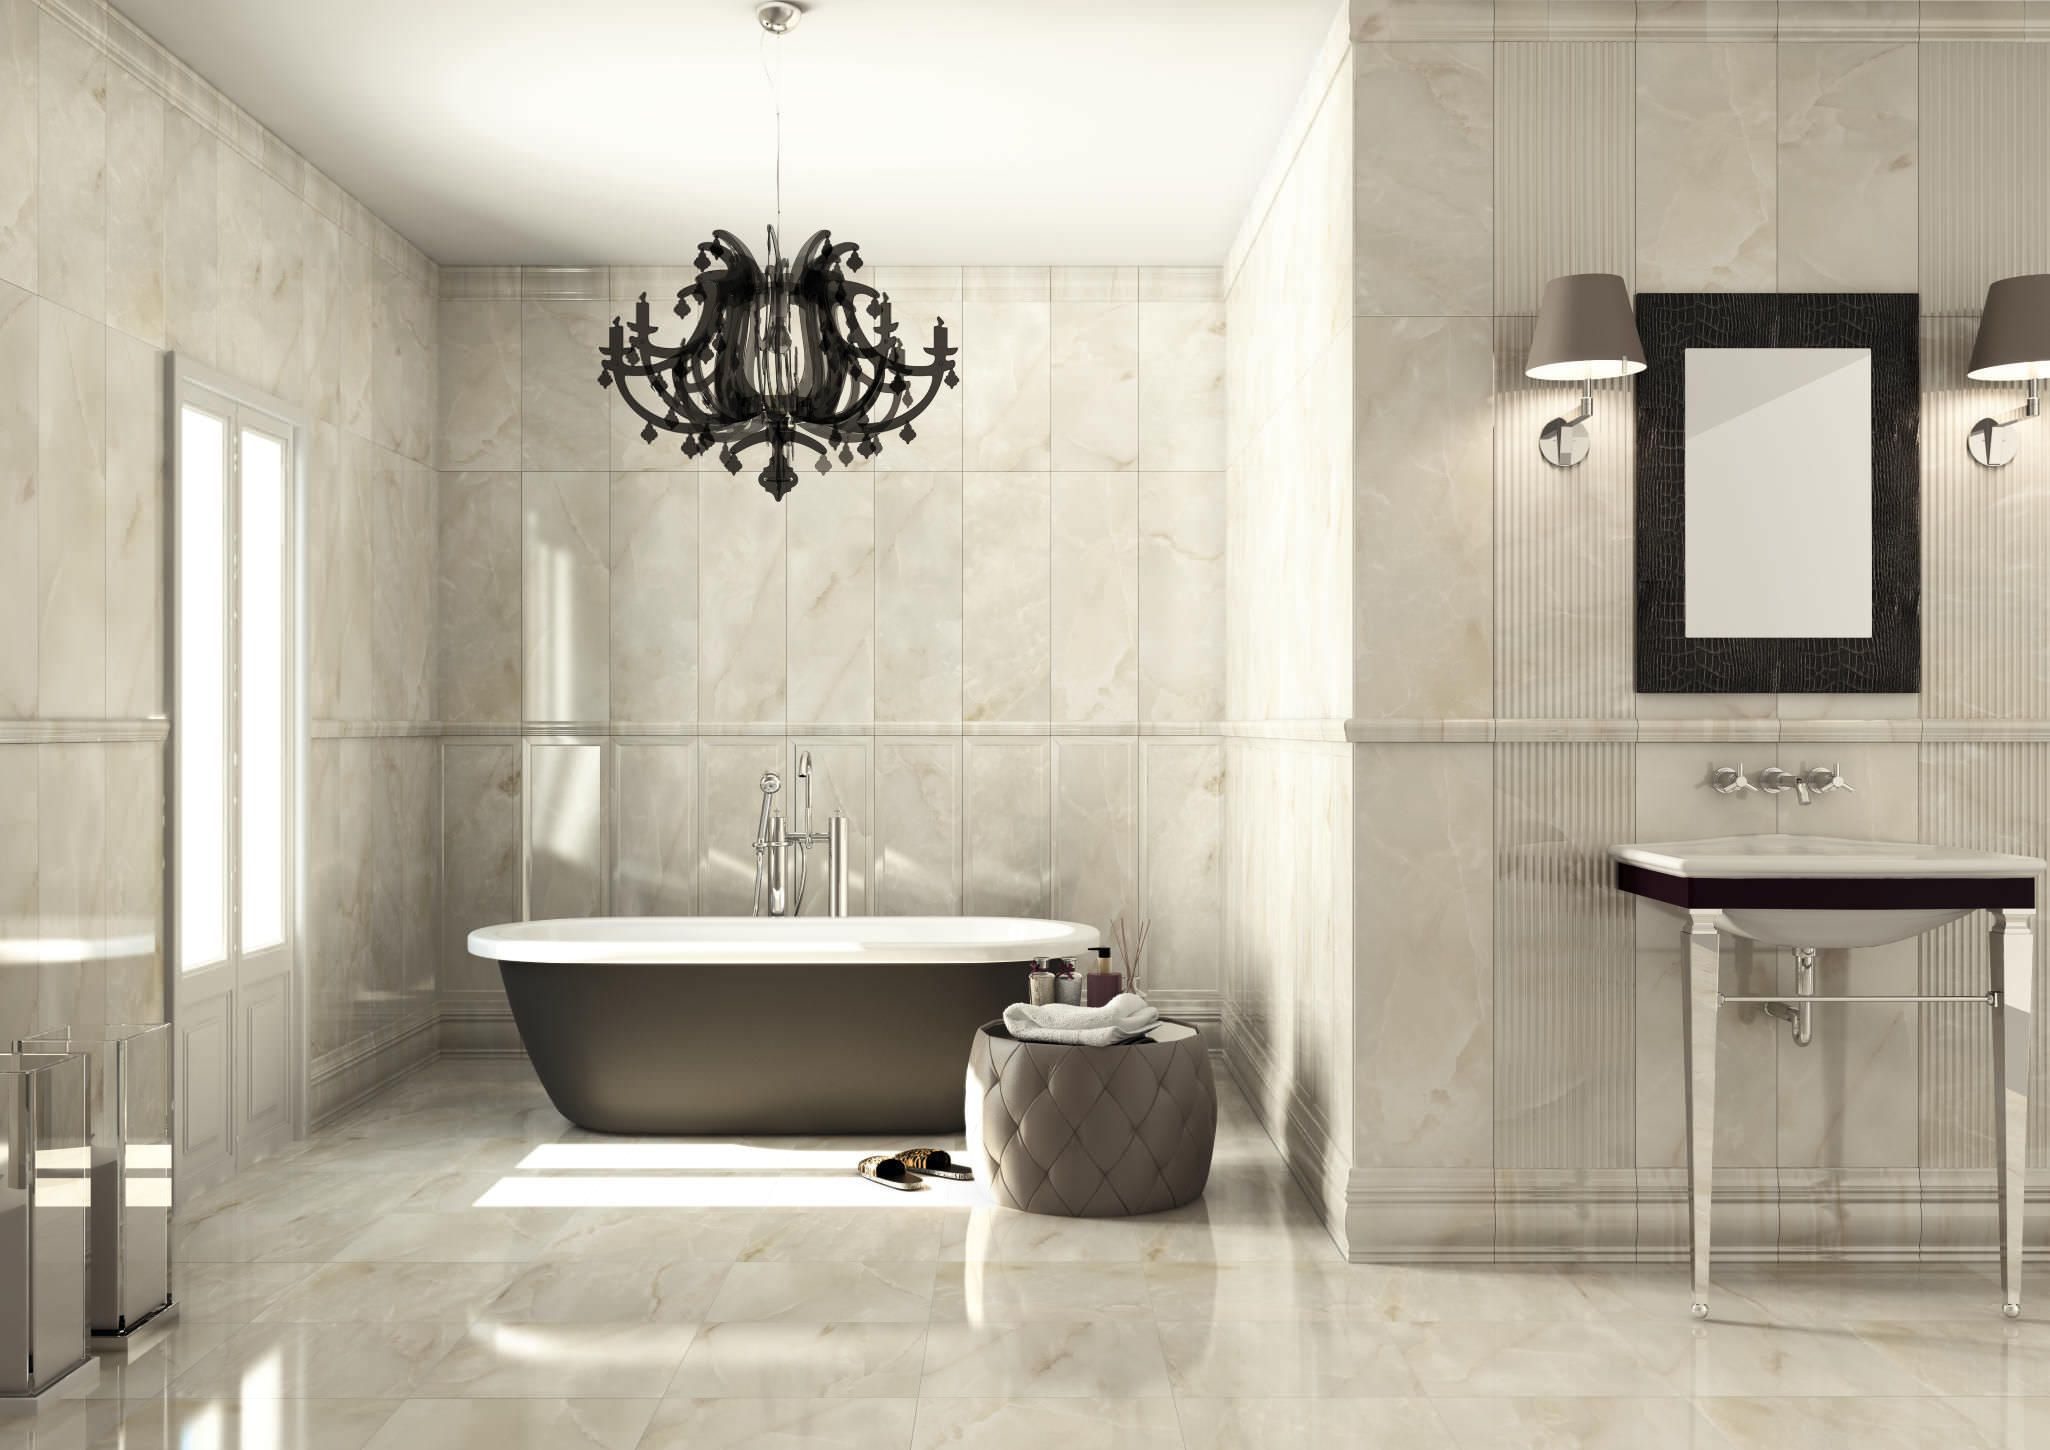 Moderne Badezimmer Kronleuchter Zu Modernisieren Ihr Bad Bano De Lujo Moderno Bano De Granito Modelos De Banos